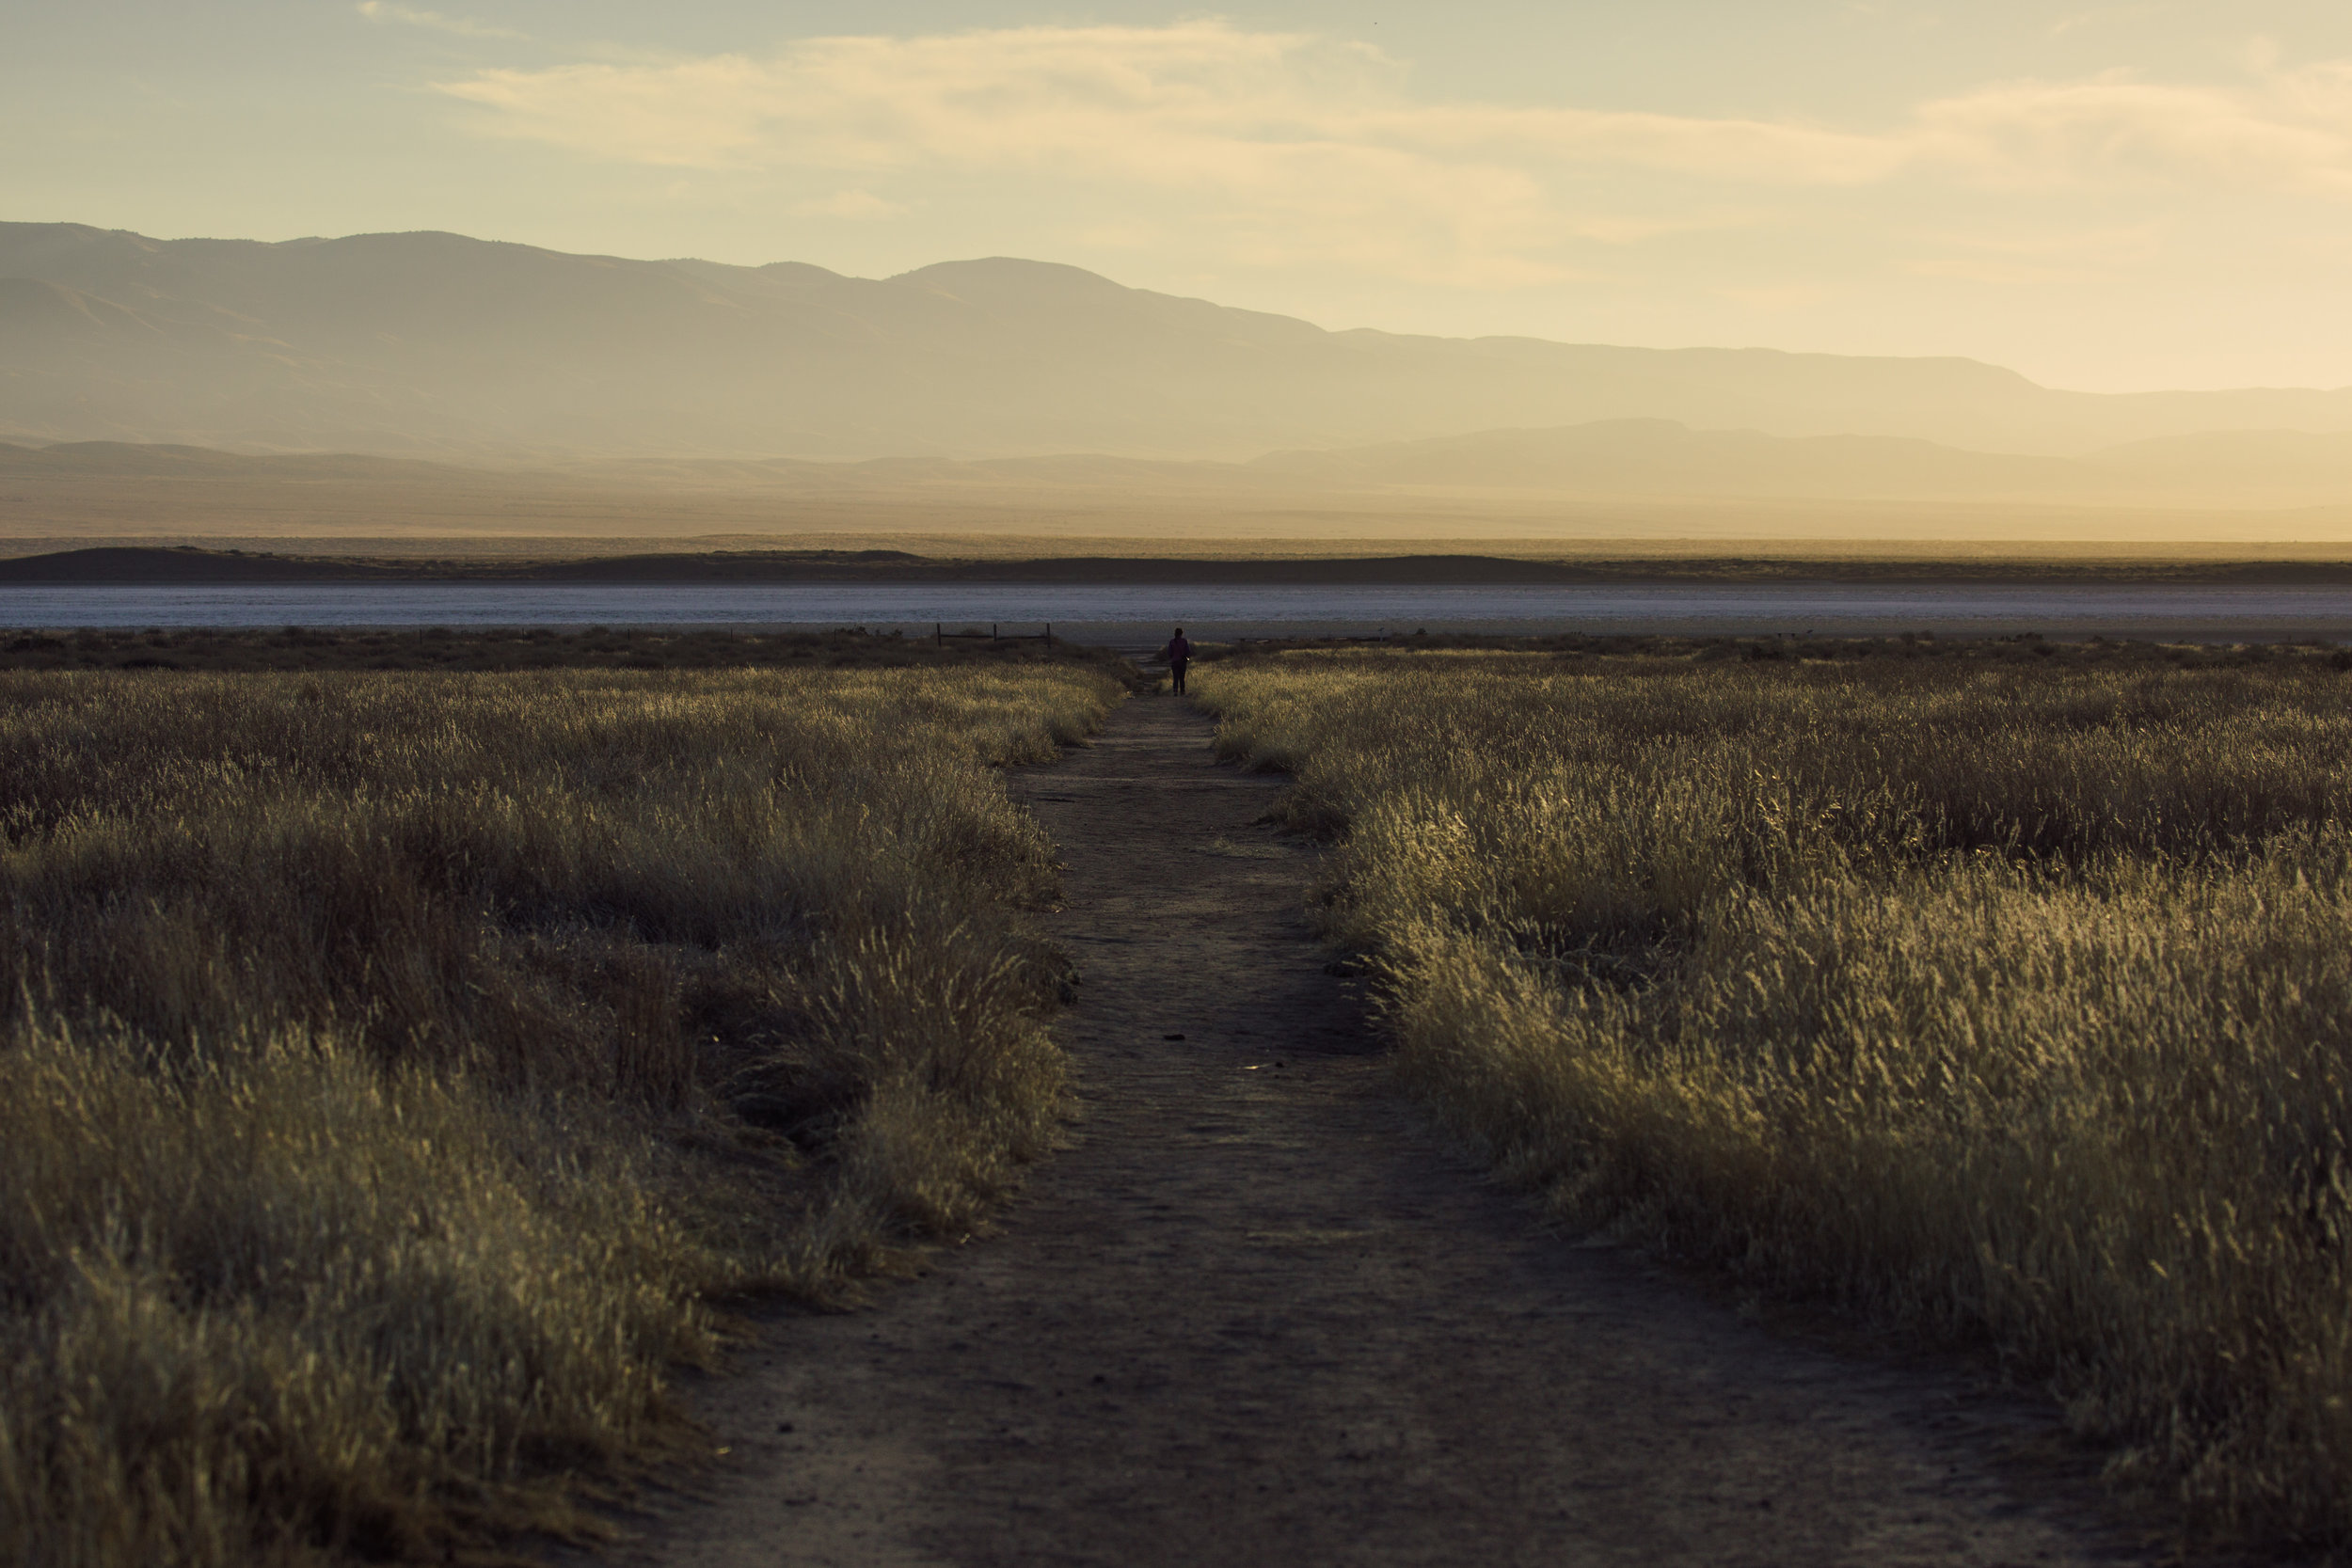 Soda Lake inside Carrizo Plain National Monument, California